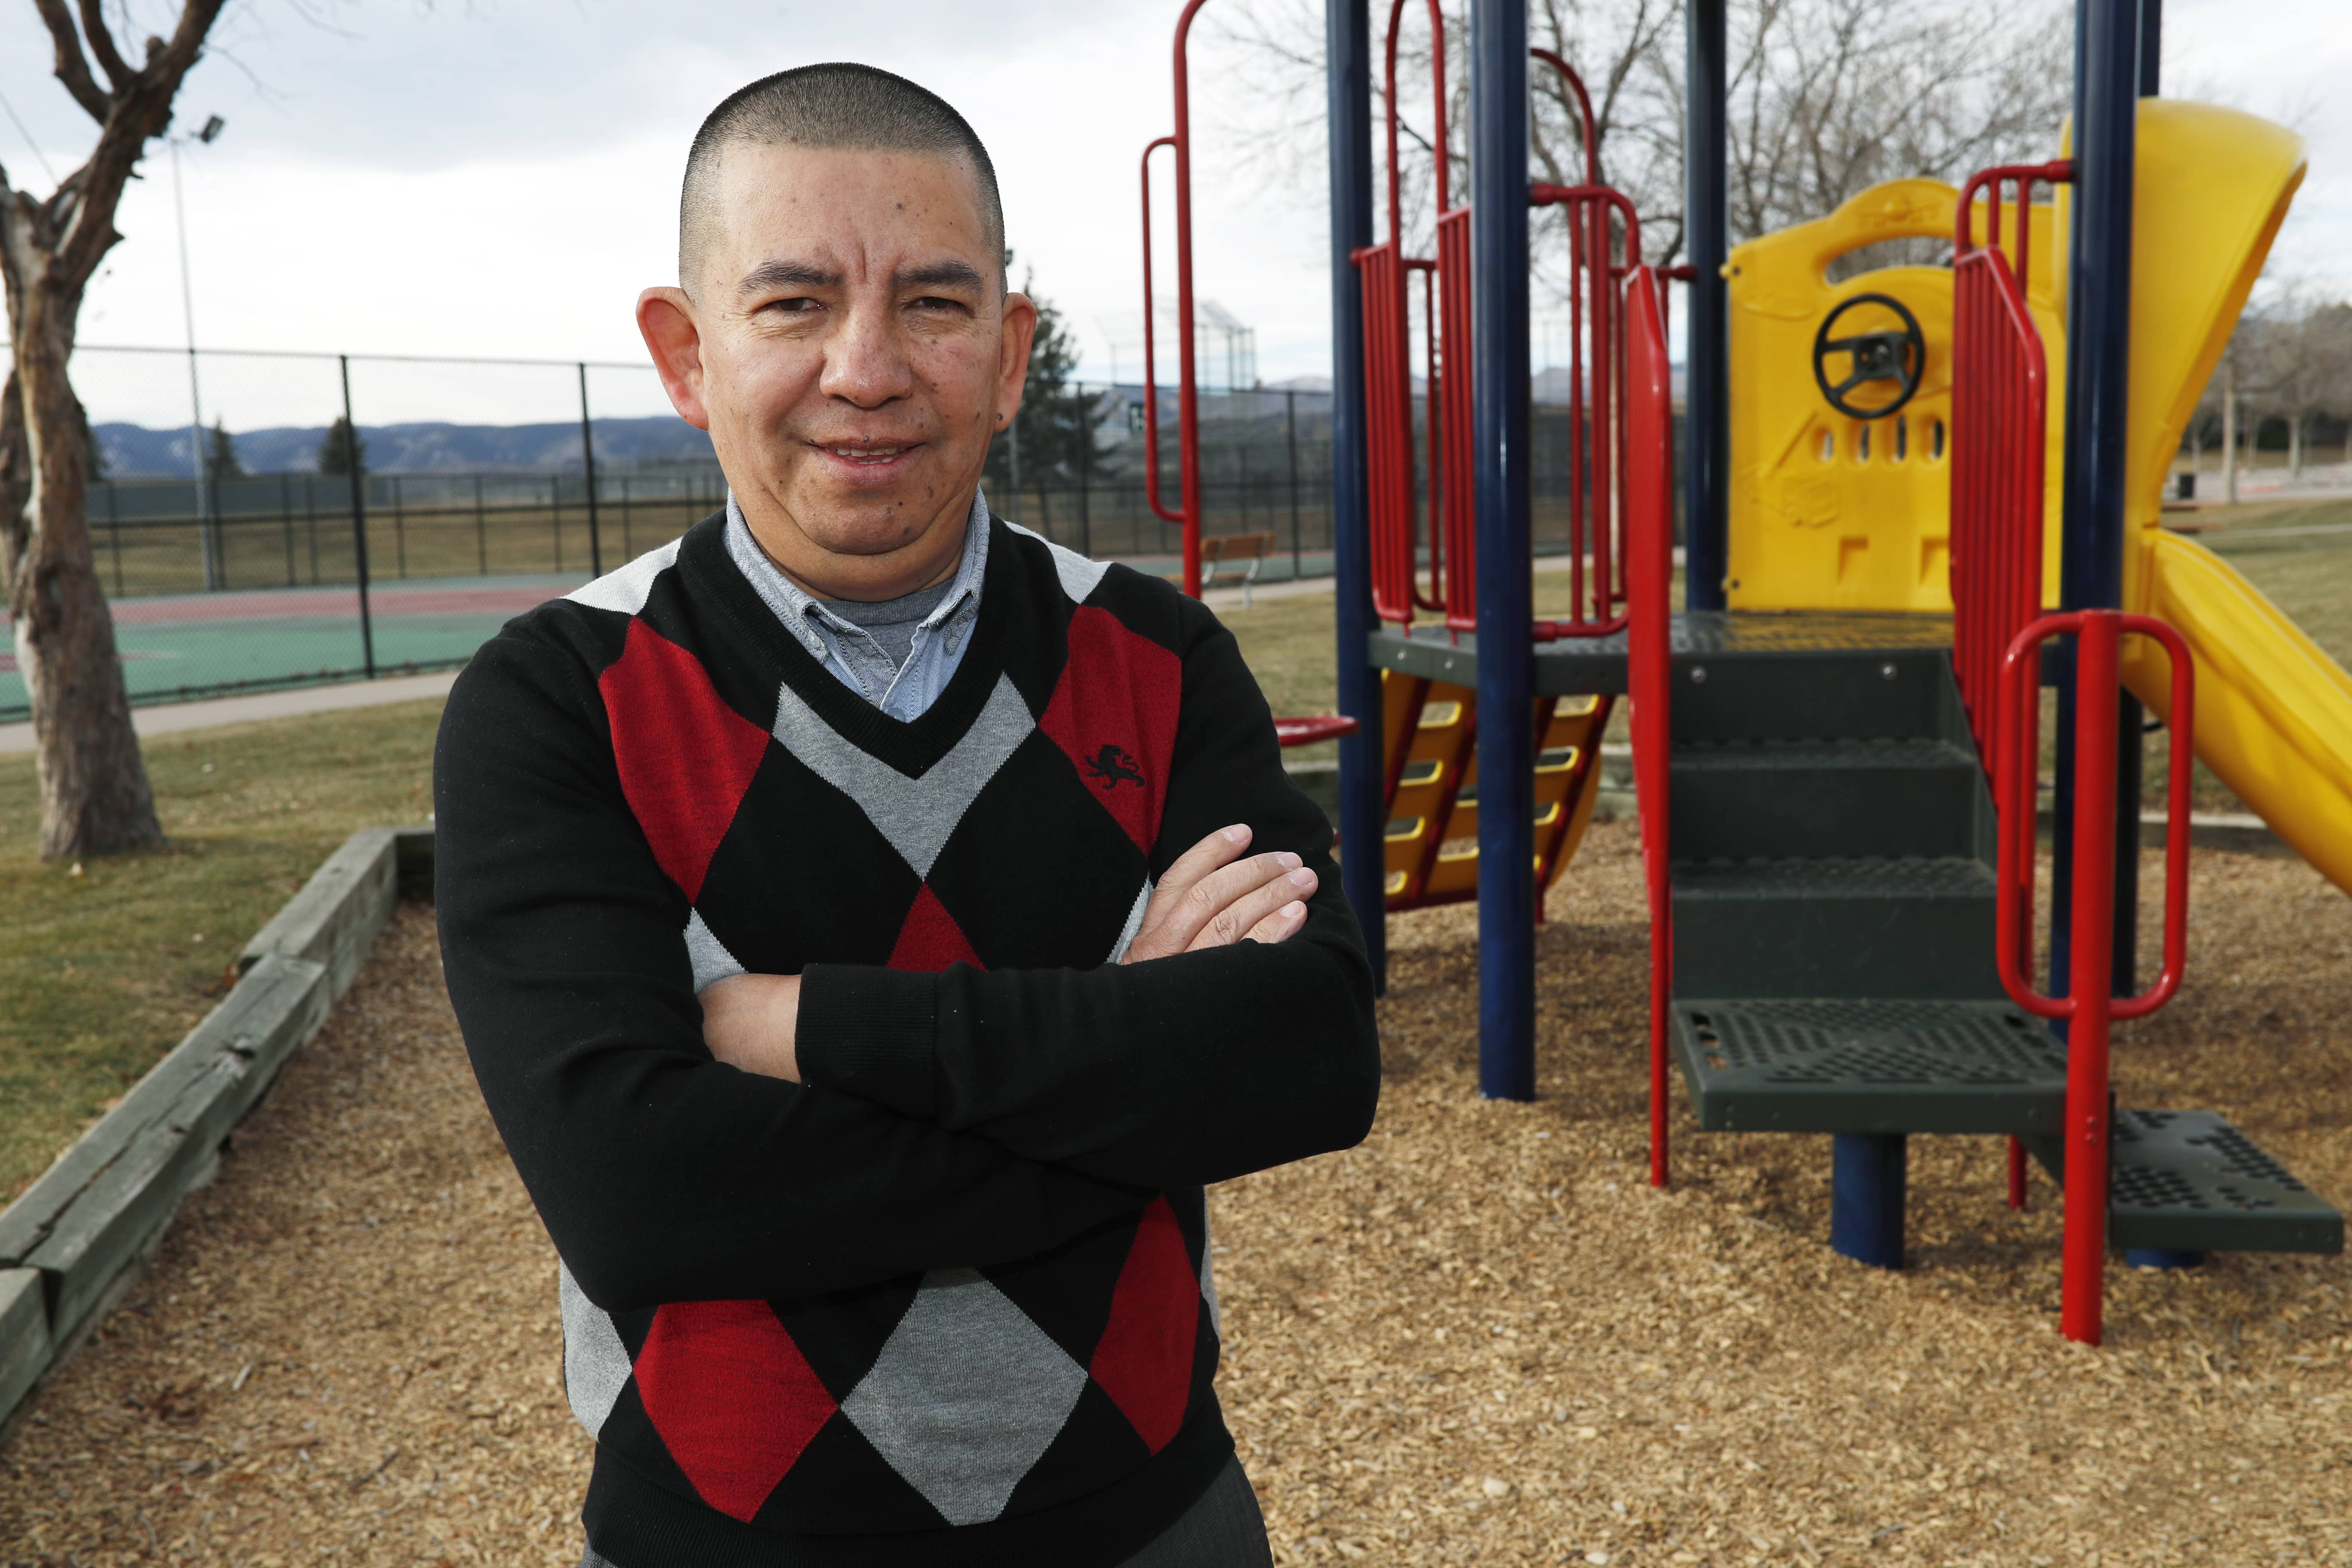 Photo of Pedro H. Gonzalez, the bi-vocational Denver pastor and board member of Colorado Family Action